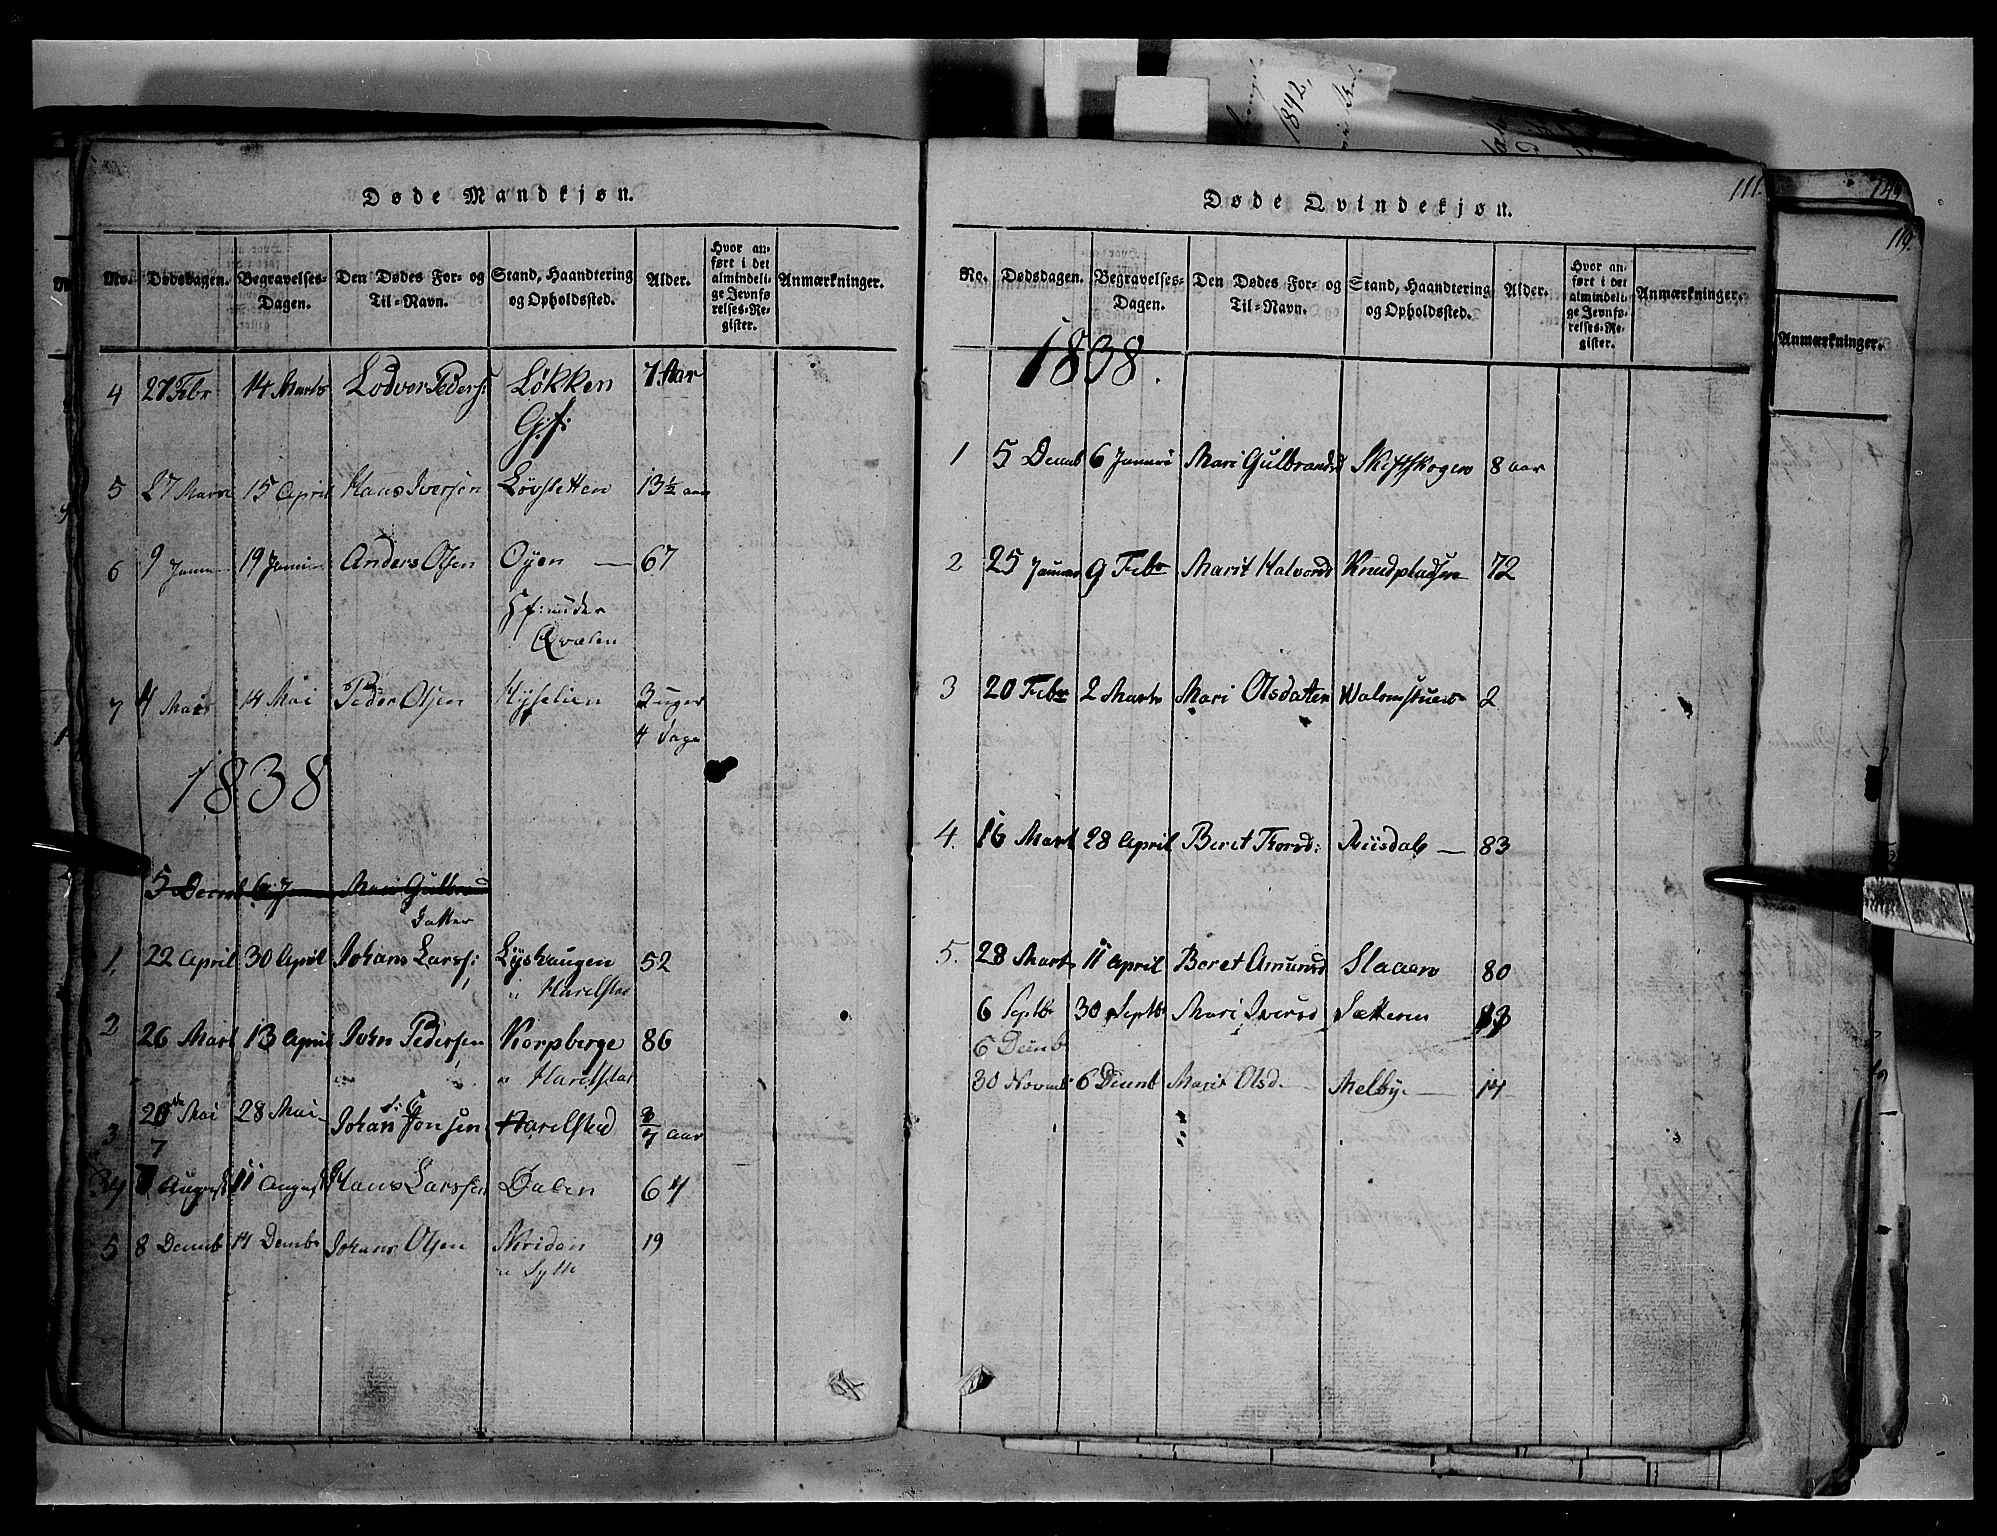 SAH, Fron prestekontor, H/Ha/Hab/L0003: Klokkerbok nr. 3, 1816-1850, s. 111